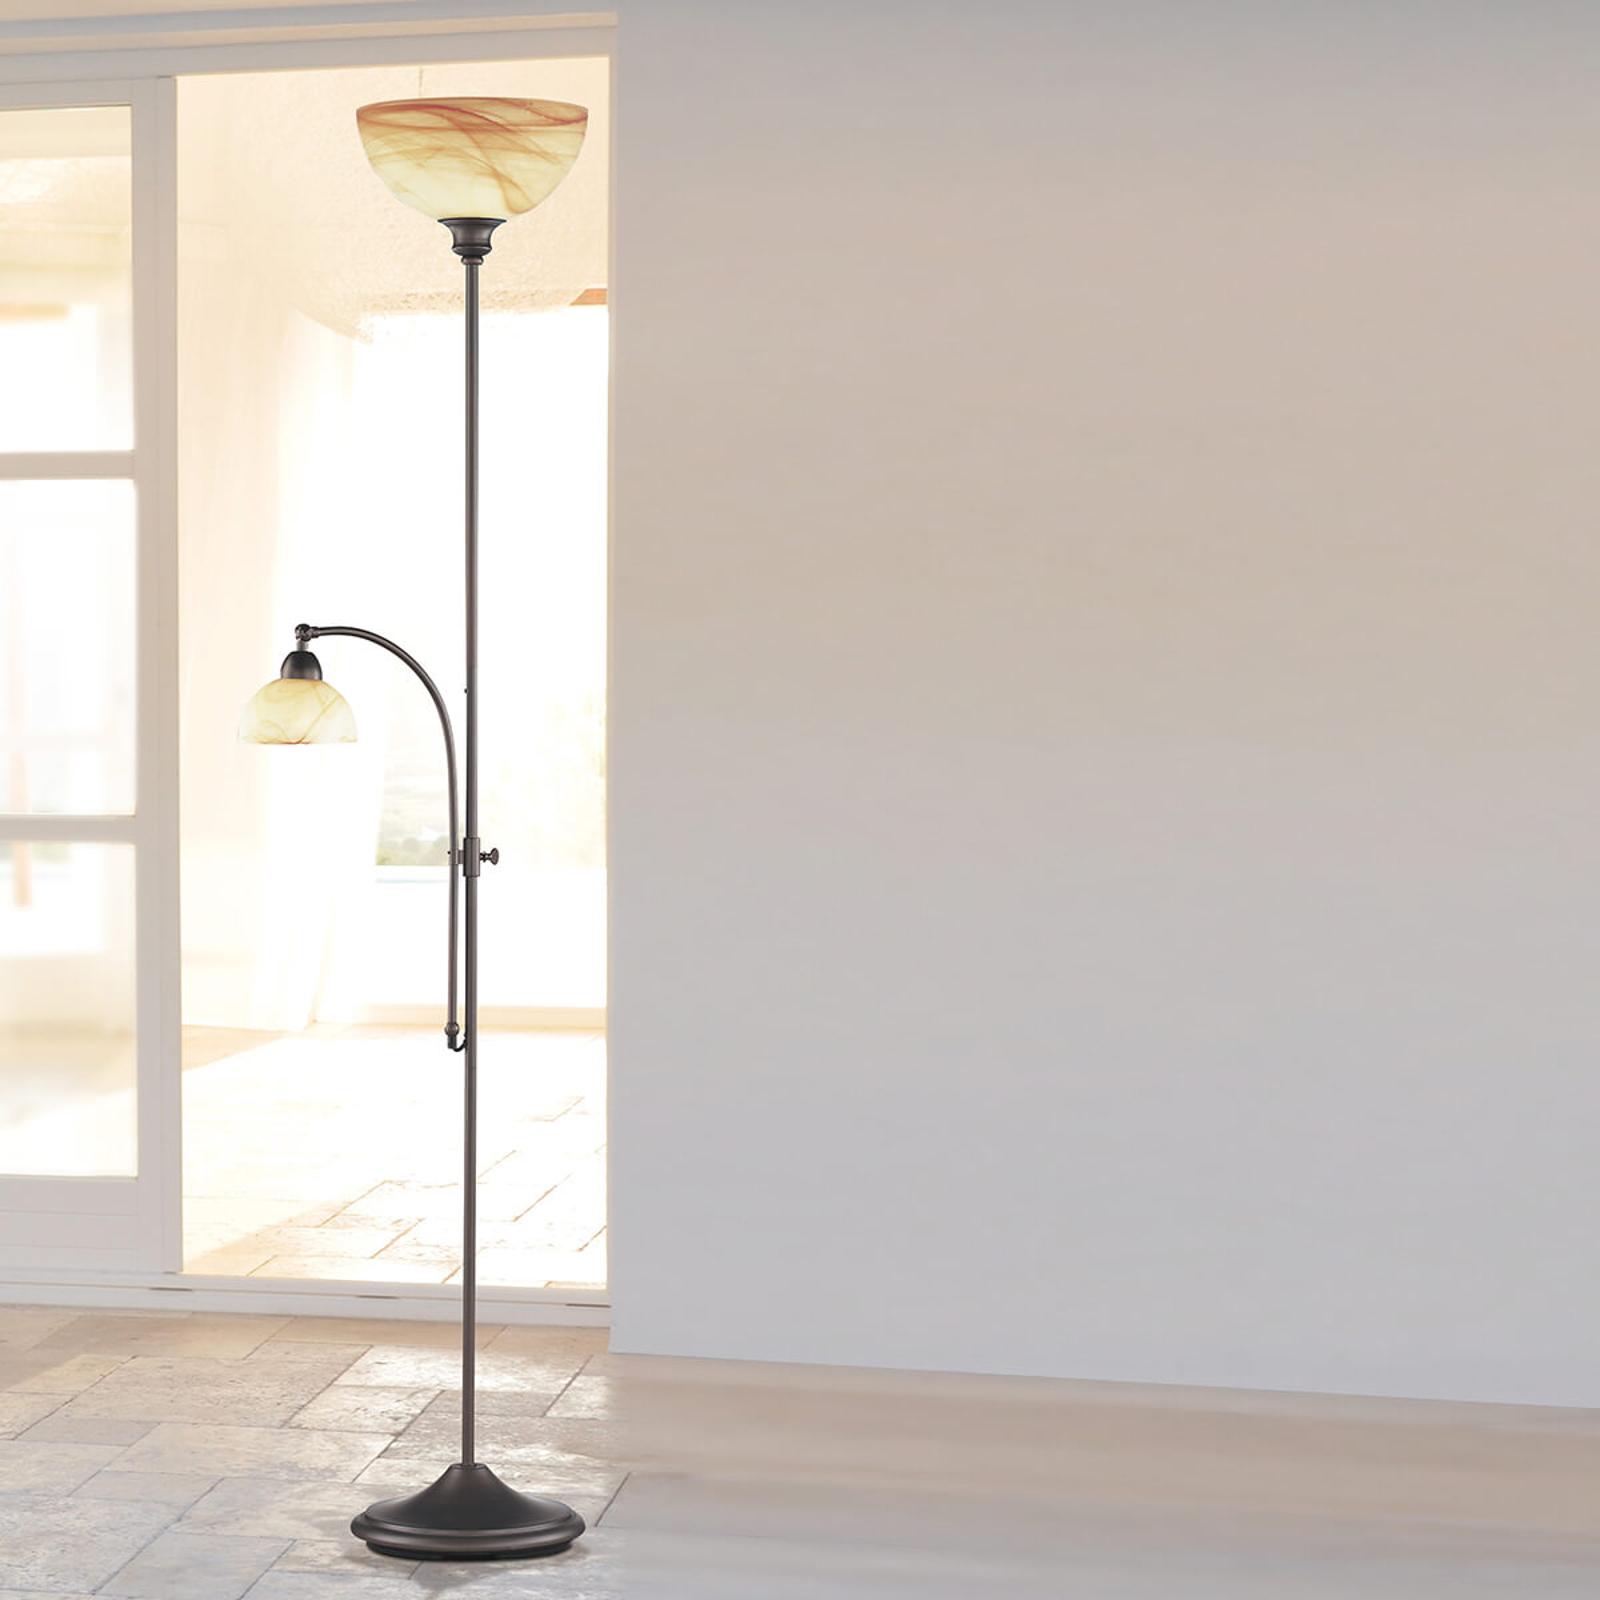 Lacchino stålampe med fotdimmer